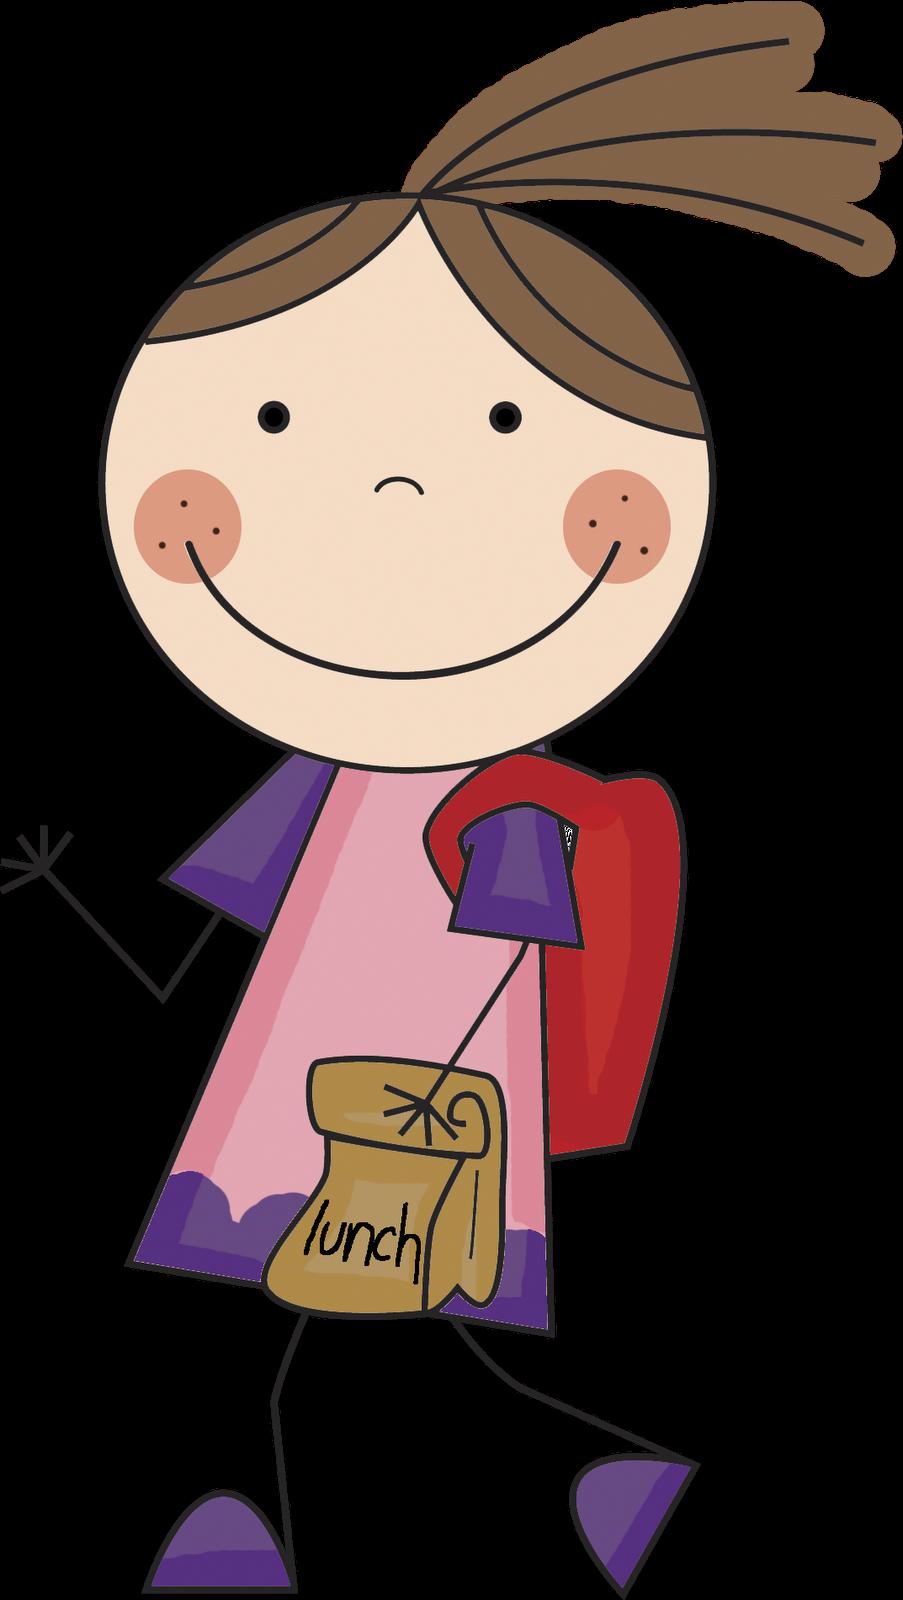 Abschied clipart schule clipart royalty free download ☽ ̍̑⚈͜ ̍̑☾) Back To School | SCHOOL & BULLETIN BOARDS ... clipart royalty free download